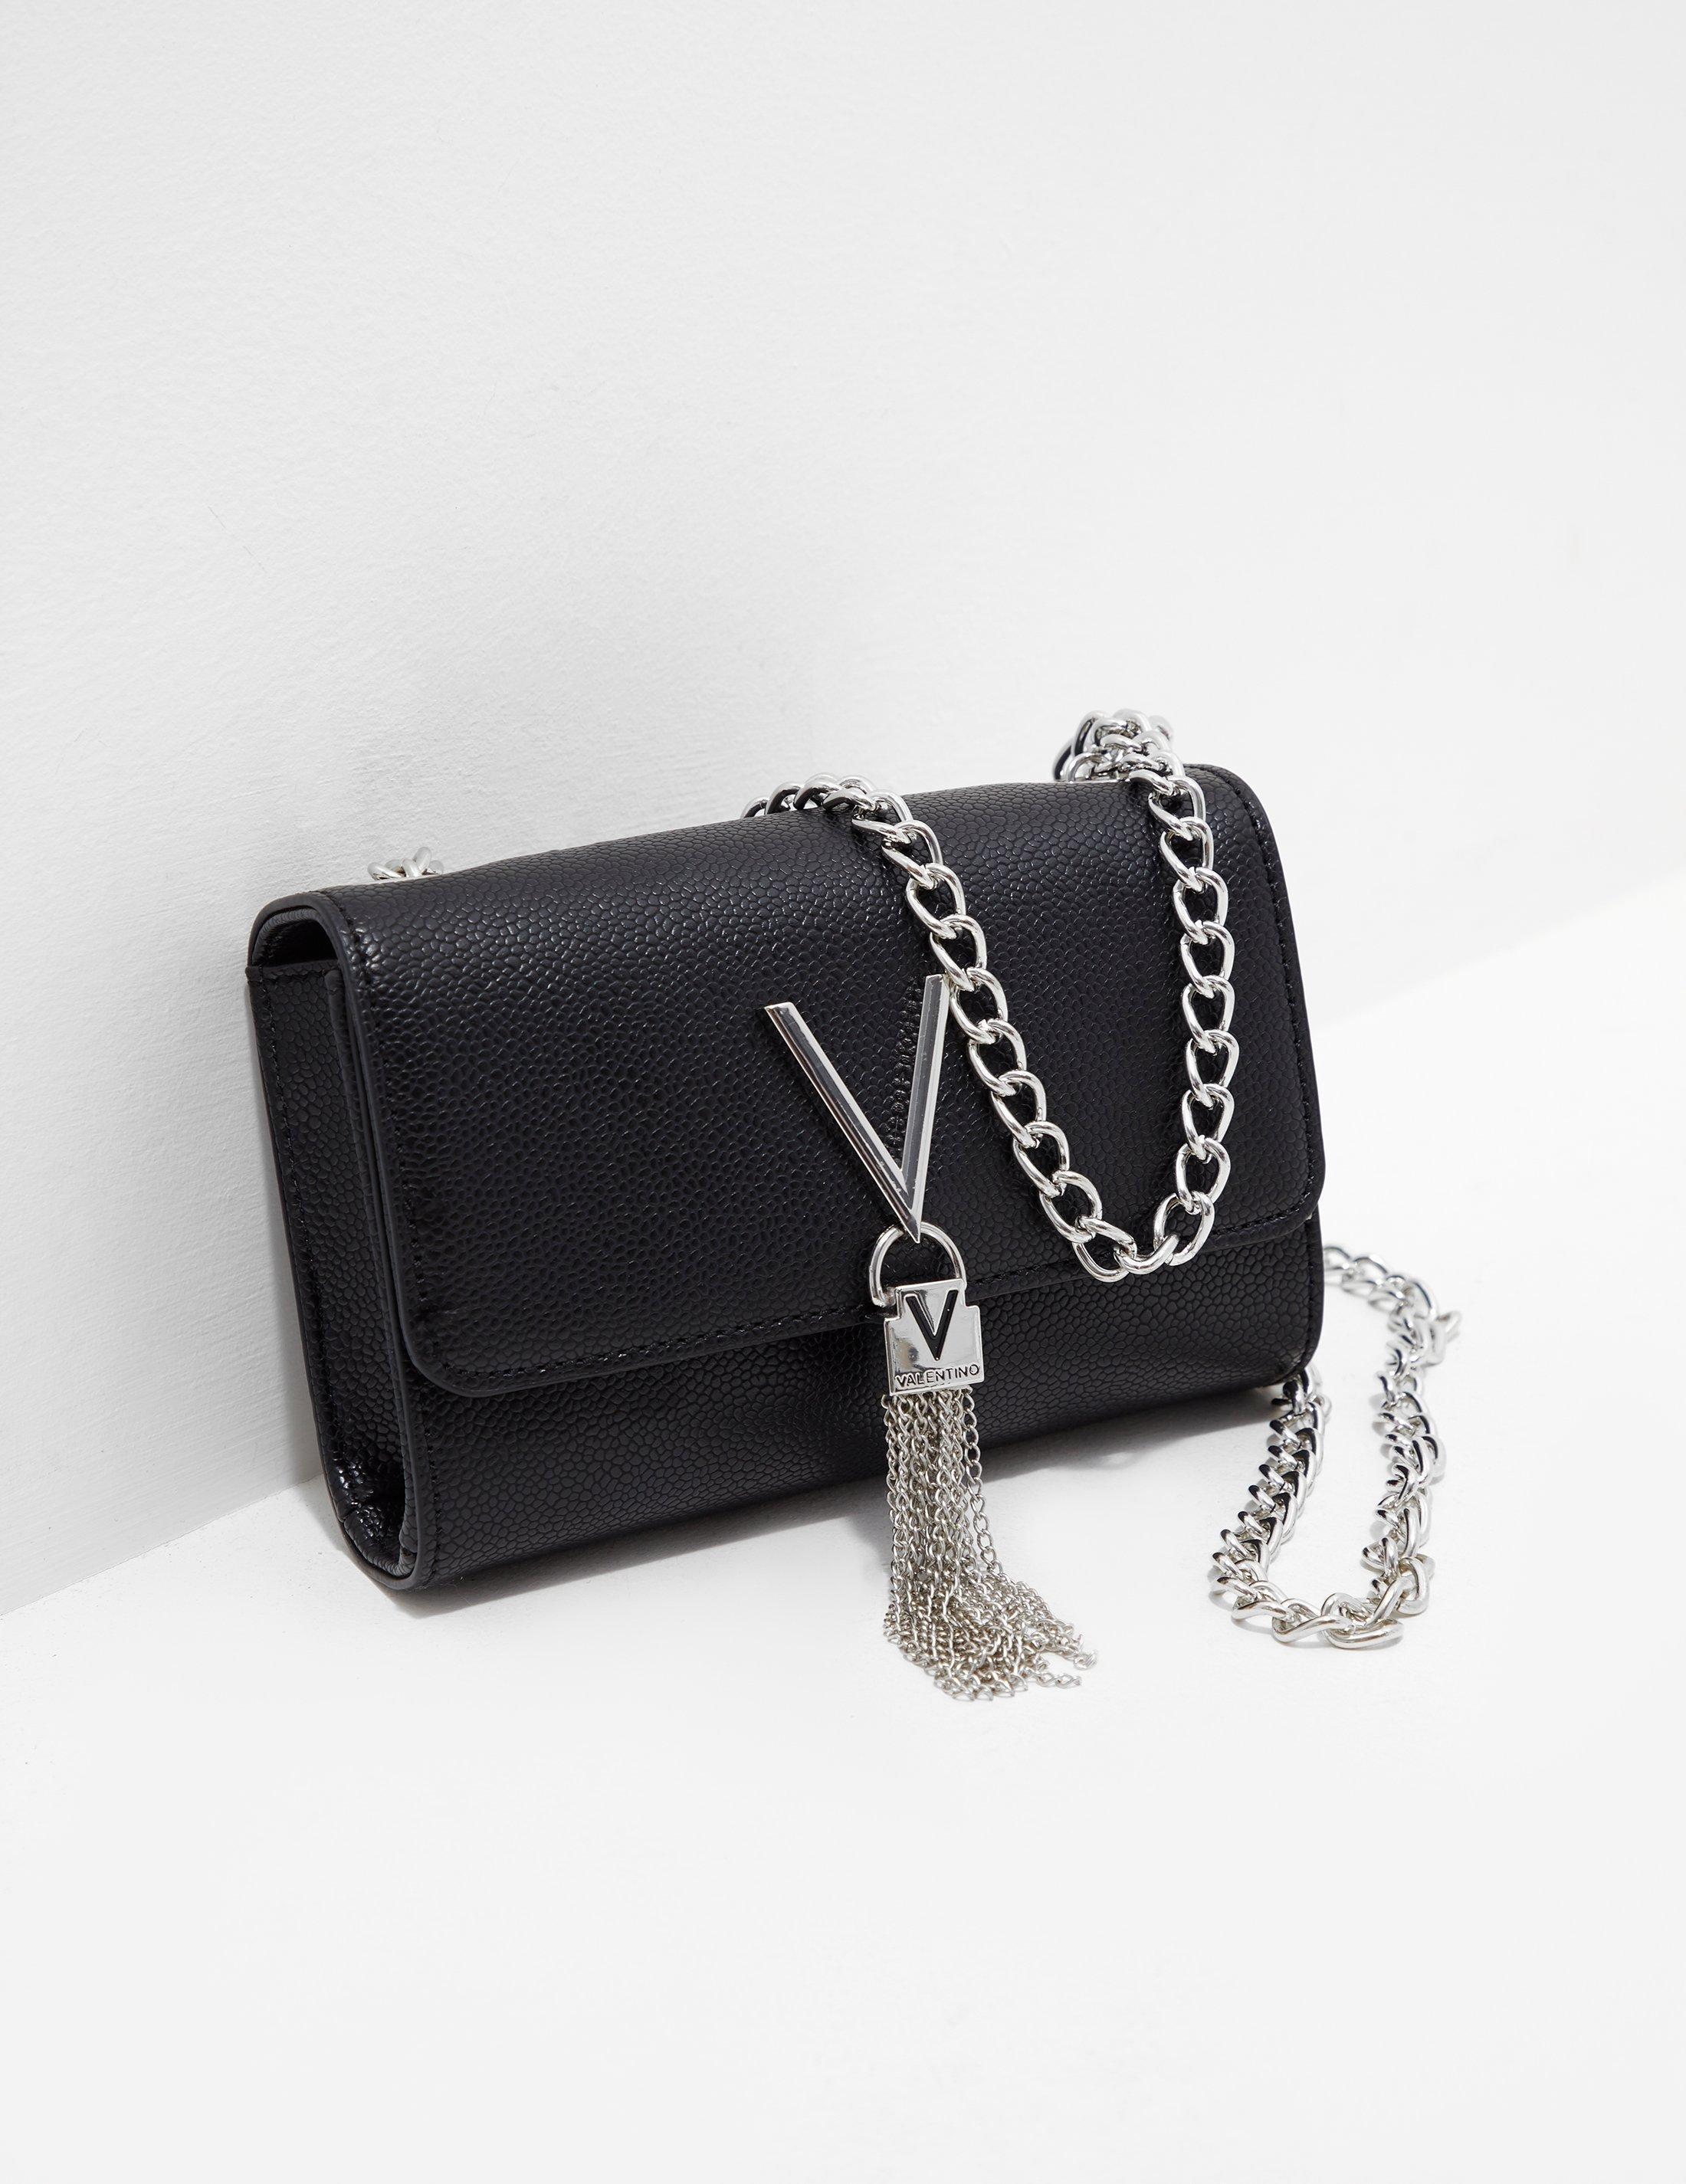 2be297c67 Valentino By Mario Valentino - Divina Chain Shoulder Bag Black - Lyst. View  fullscreen